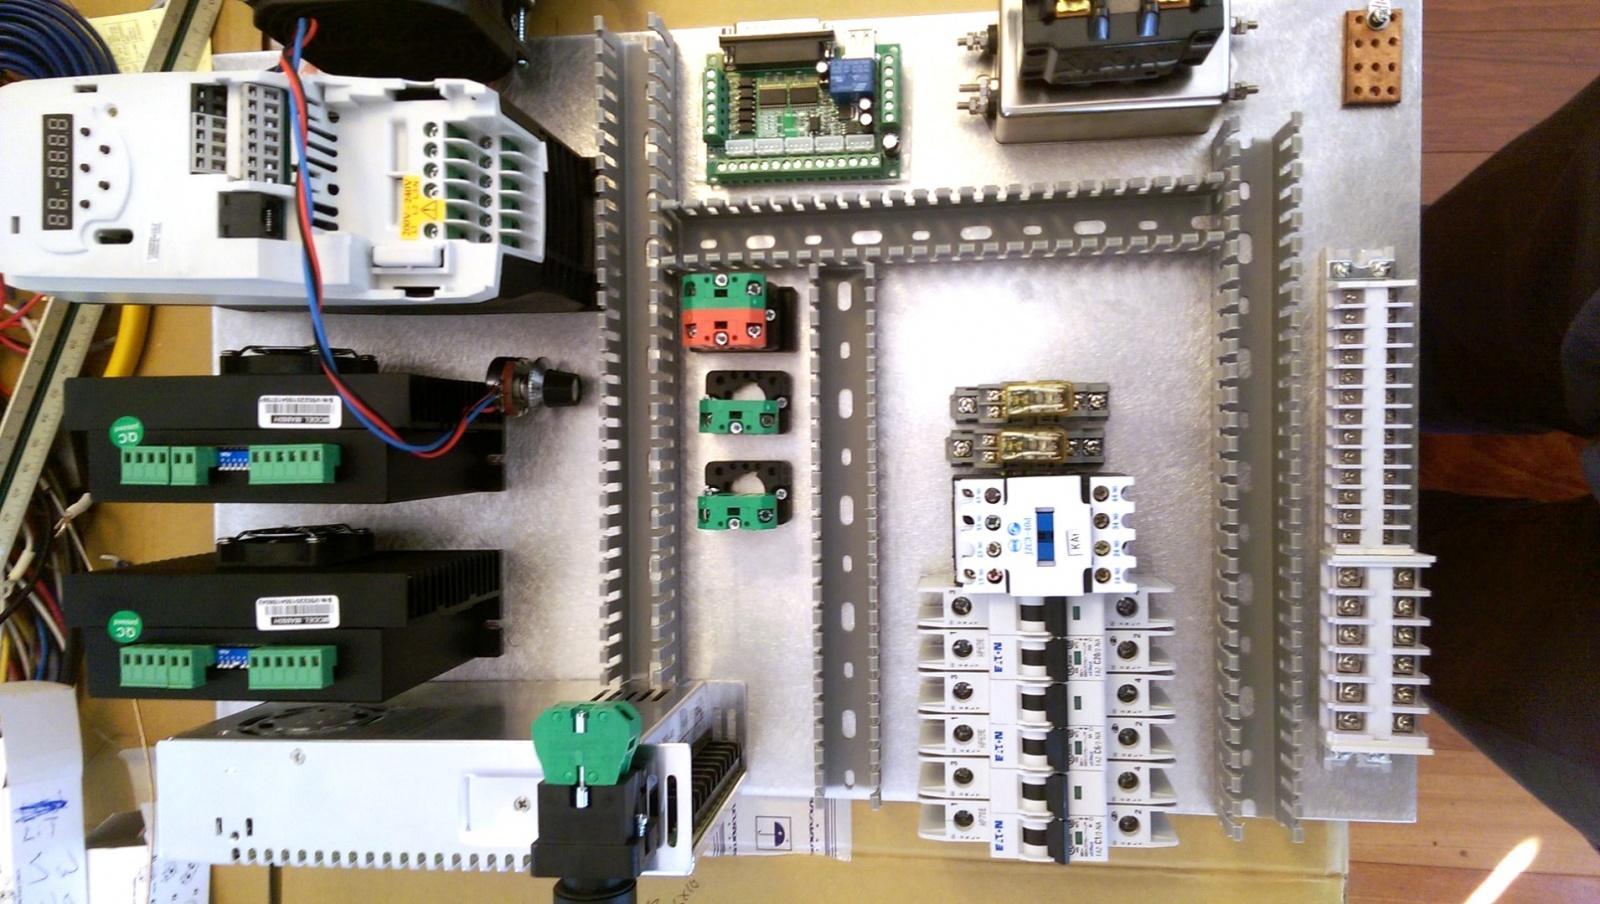 Модернизация токарного станка под работу с ЧПУ - 8